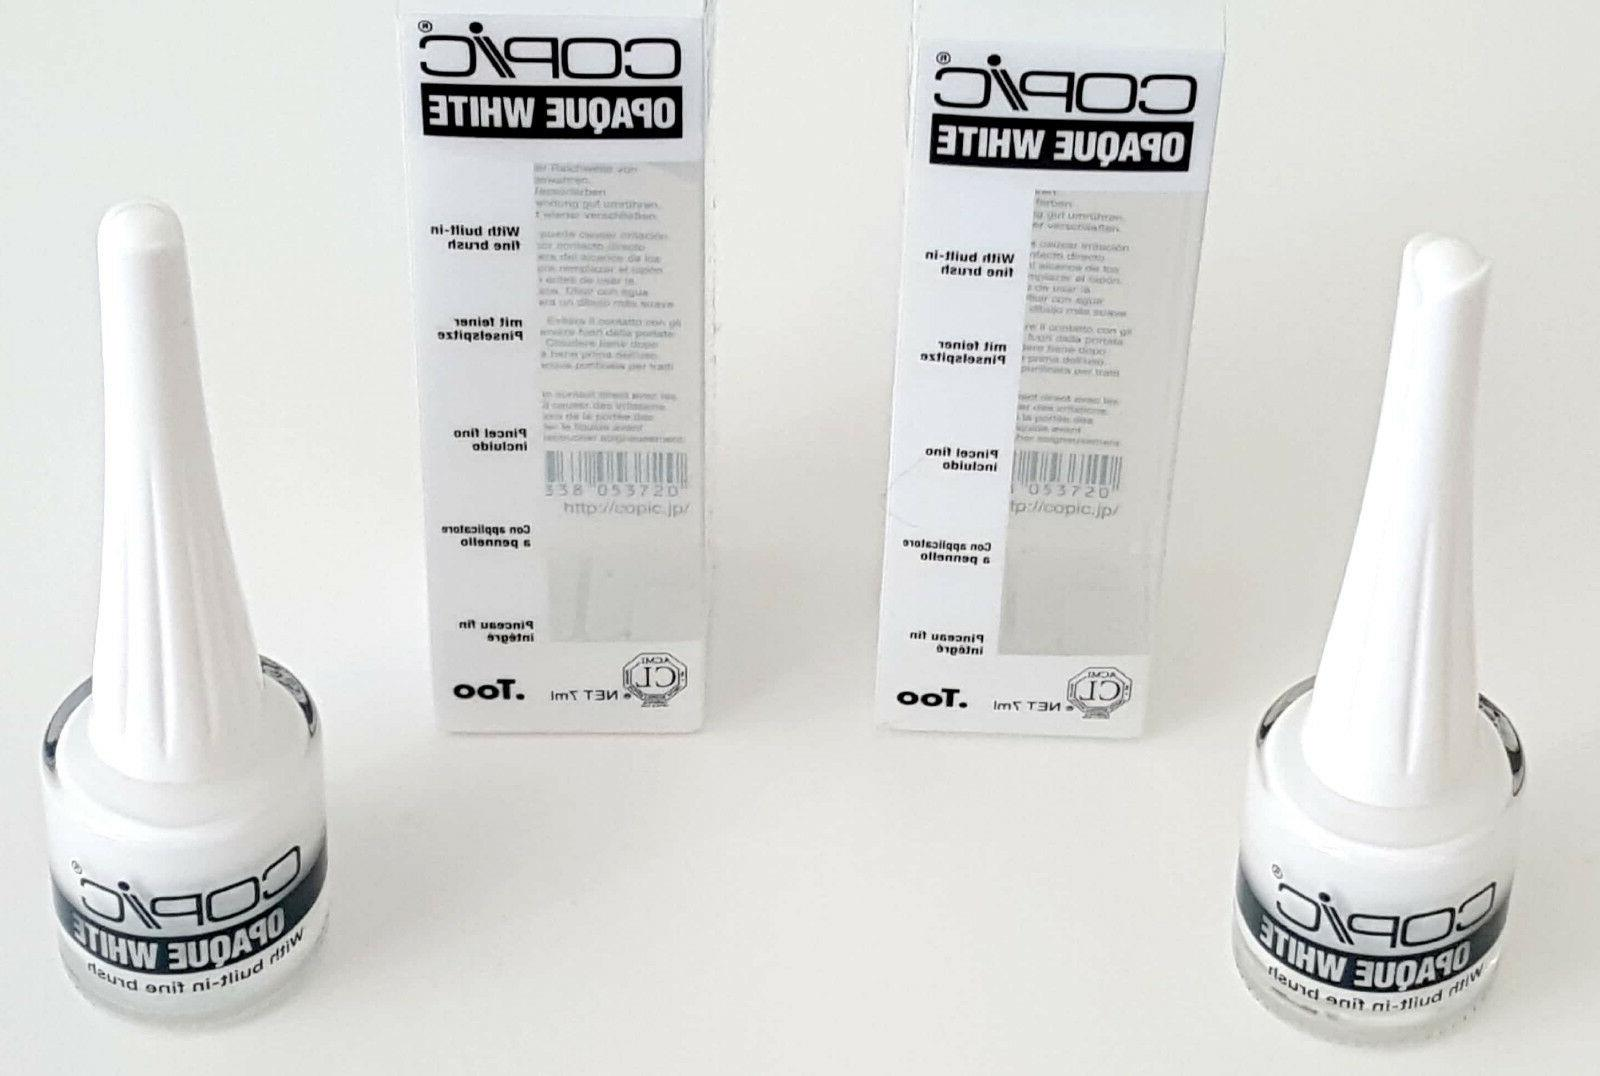 Copic Opaque White Pigment W/Brush 10Ml